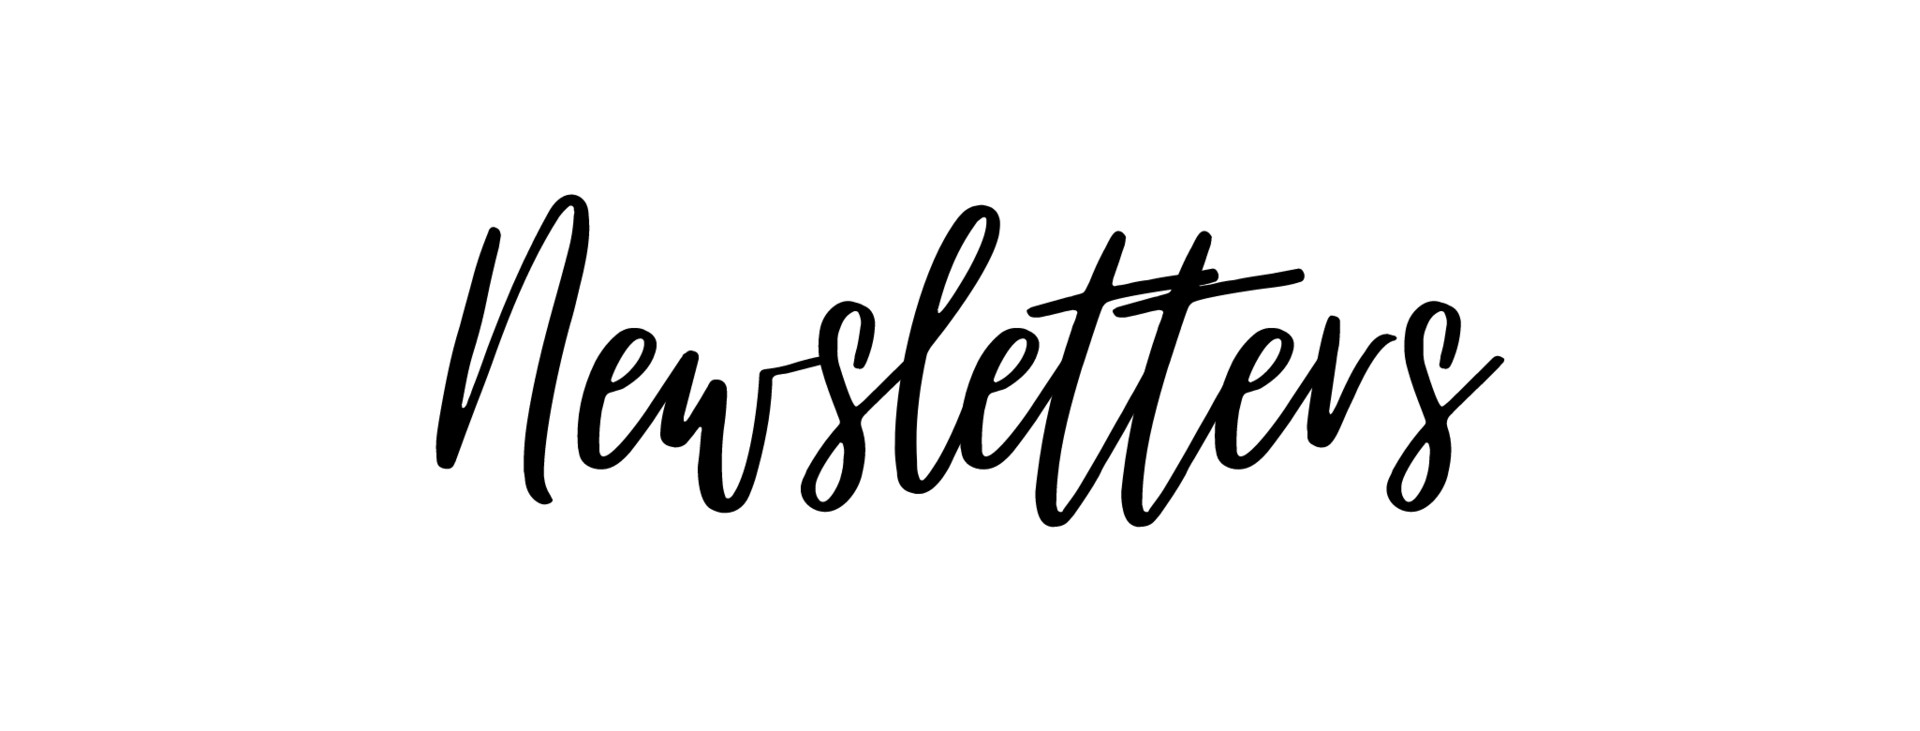 Newsletter Title